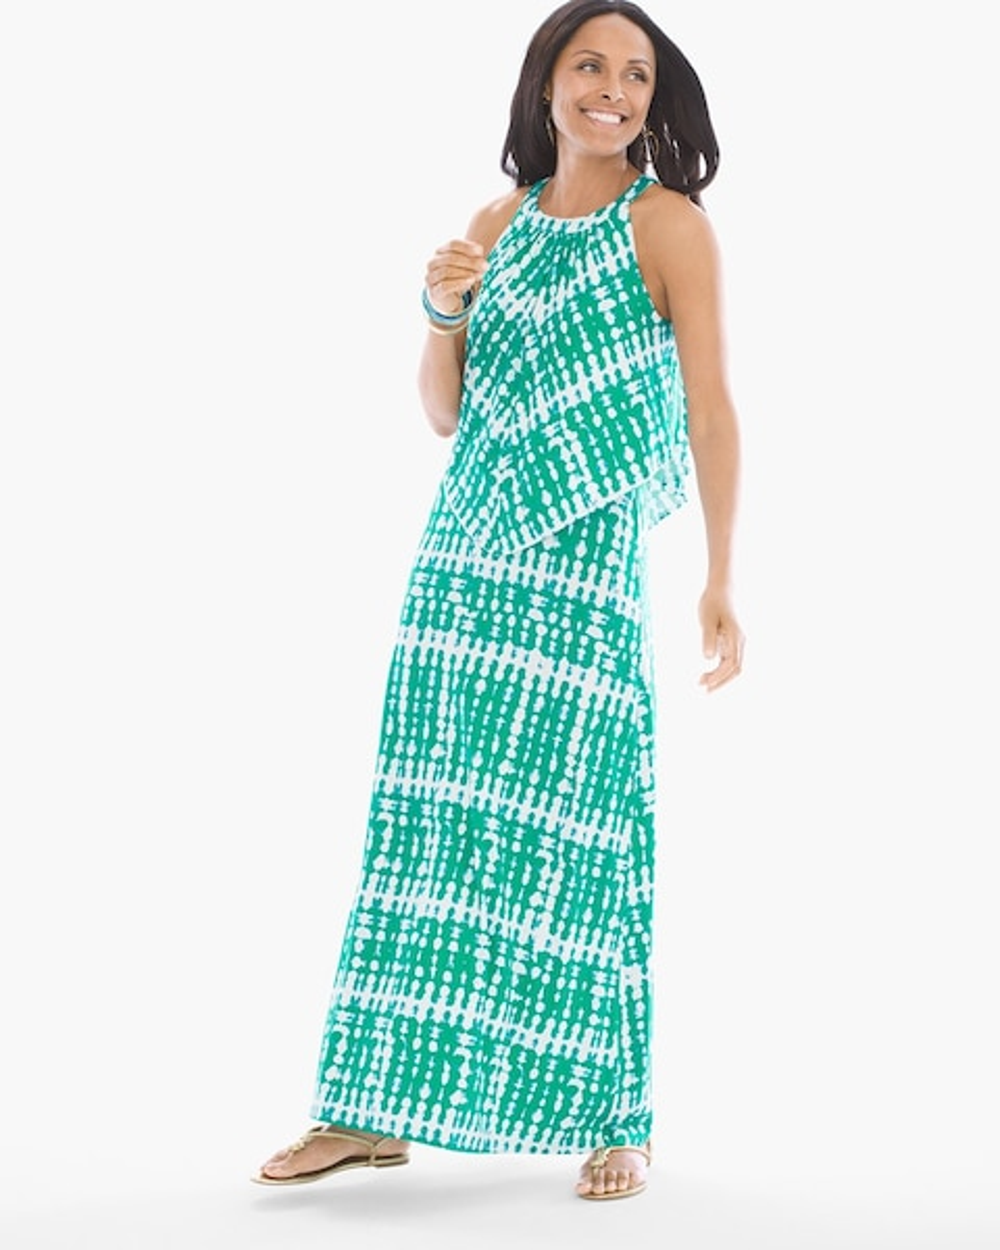 87cdd4af384 Breezy Tie-Dye Popover Maxi Dress - Chico s